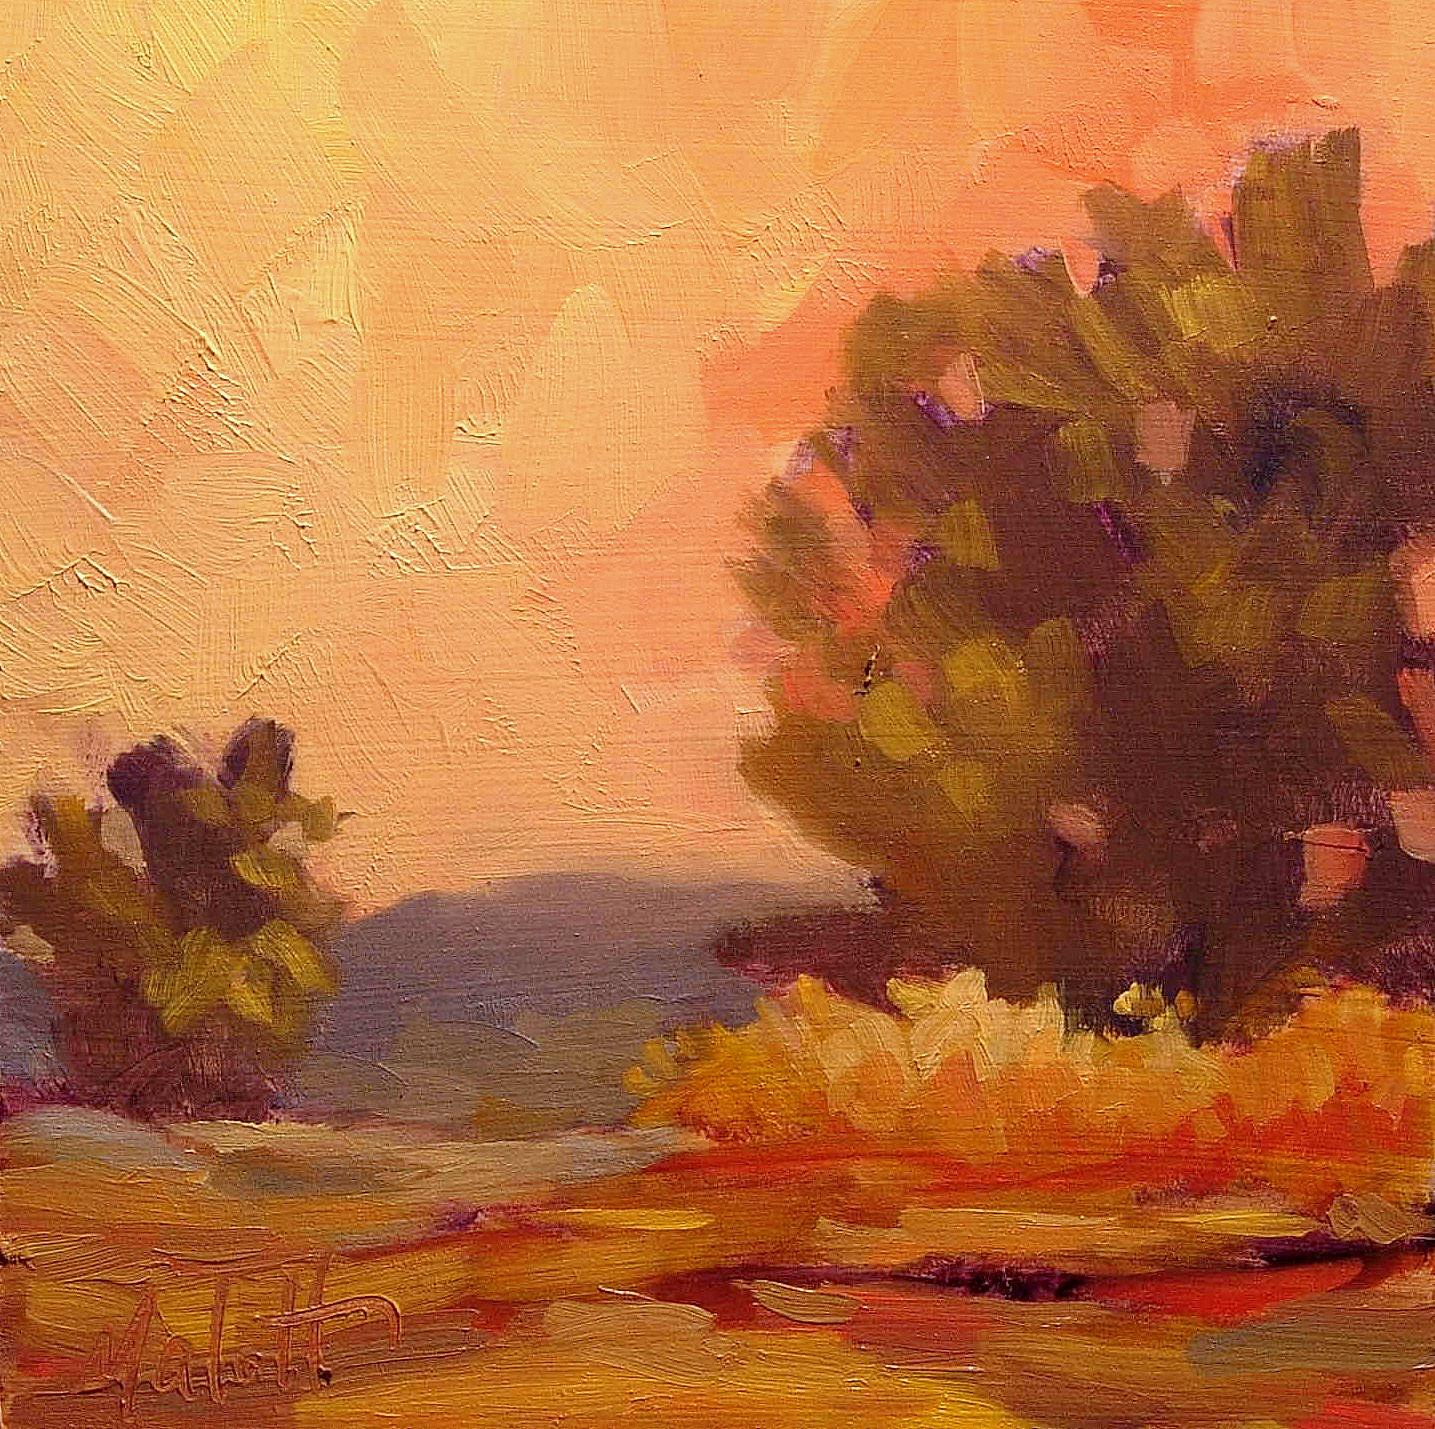 Heidi malott original paintings october 2008 for Oil painting scenery